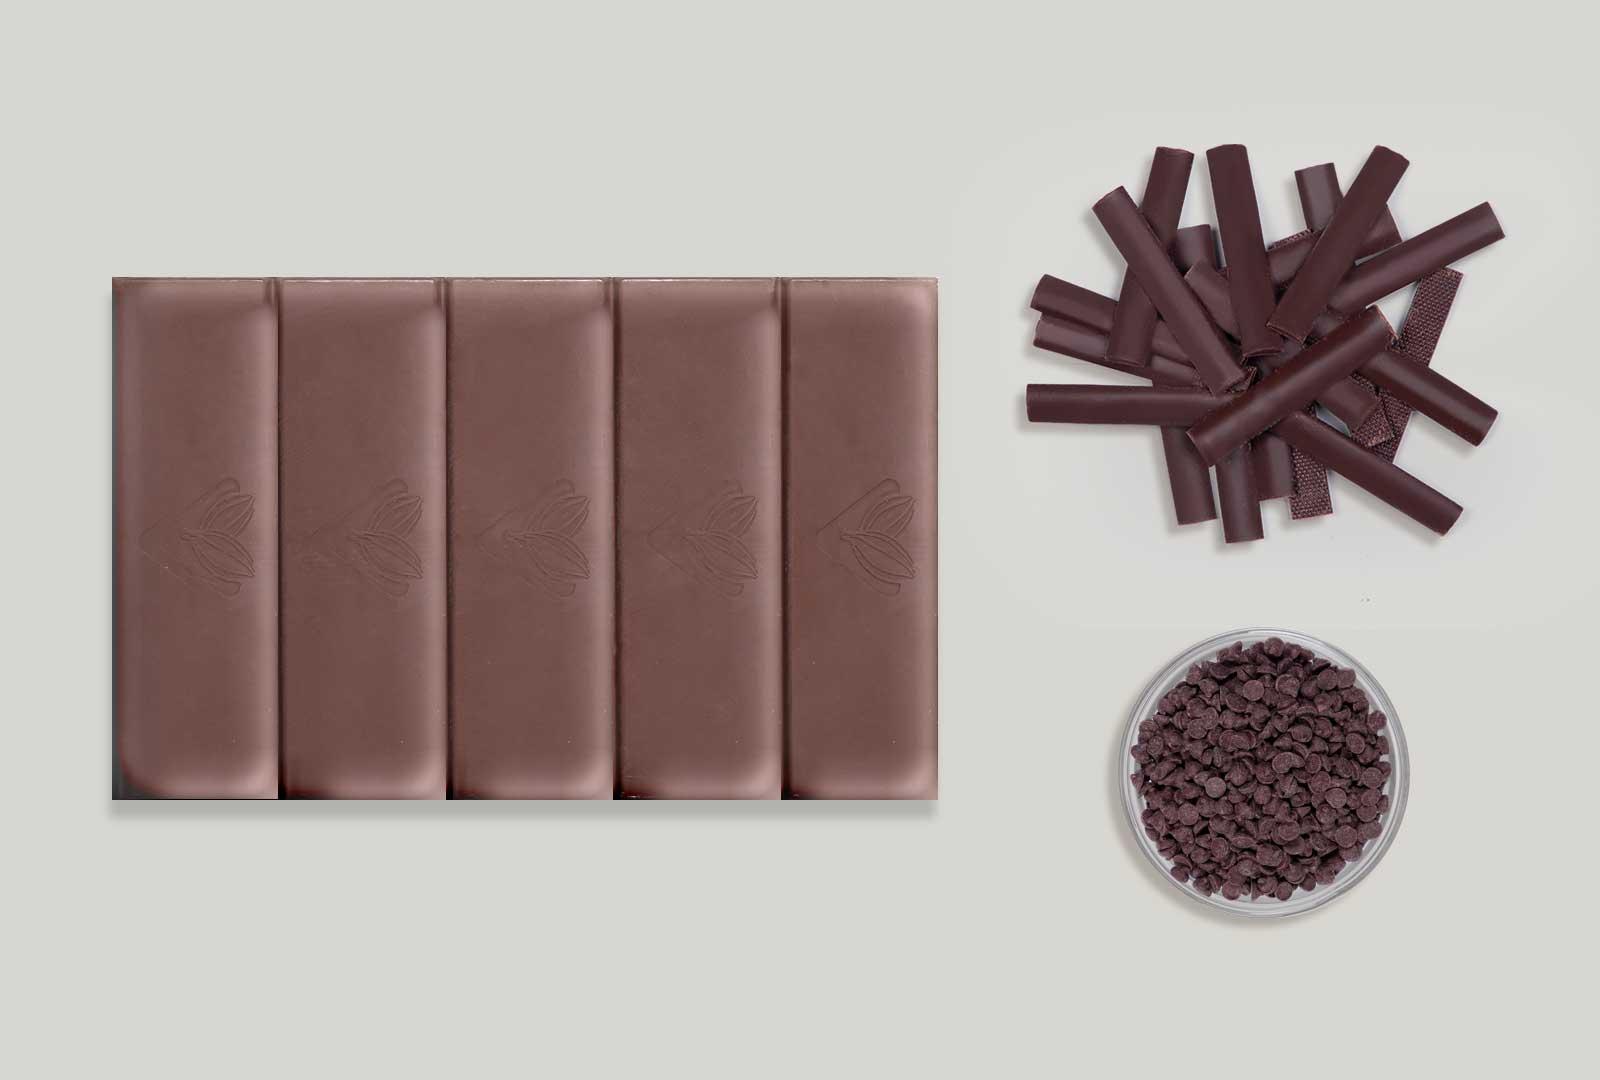 glossy-milk-chocolate-compound-1